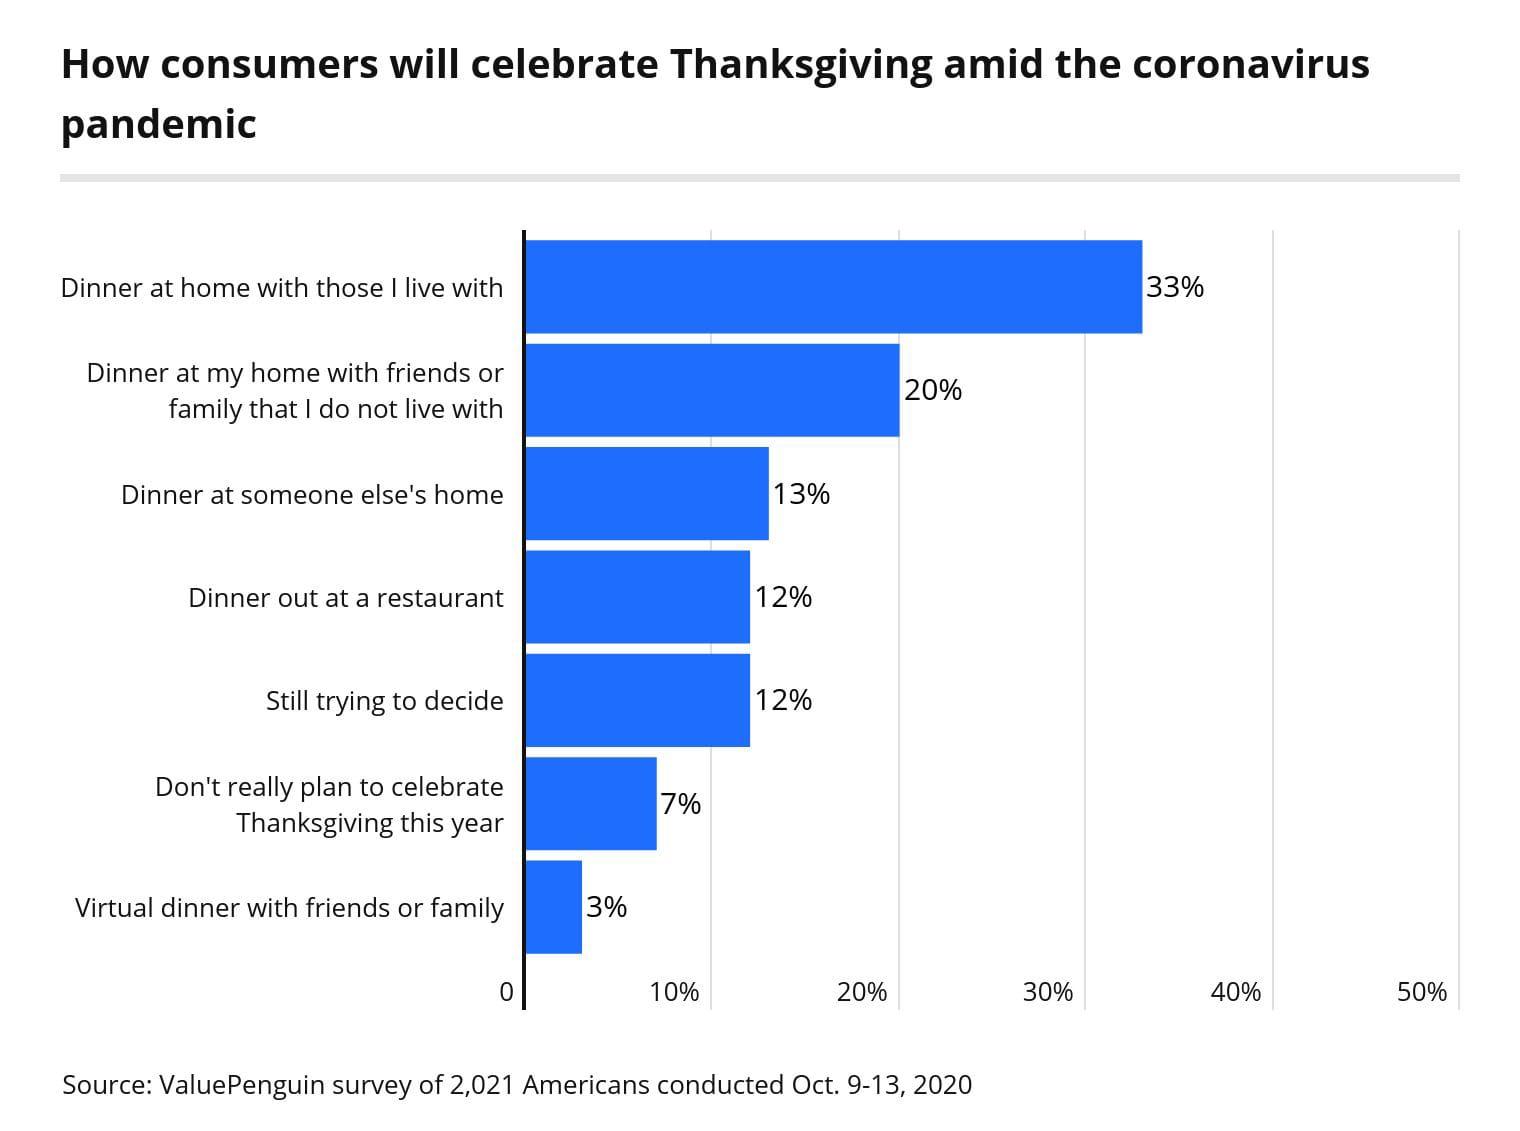 How consumers will celebrate Thanksgiving amid the coronavirus pandemic